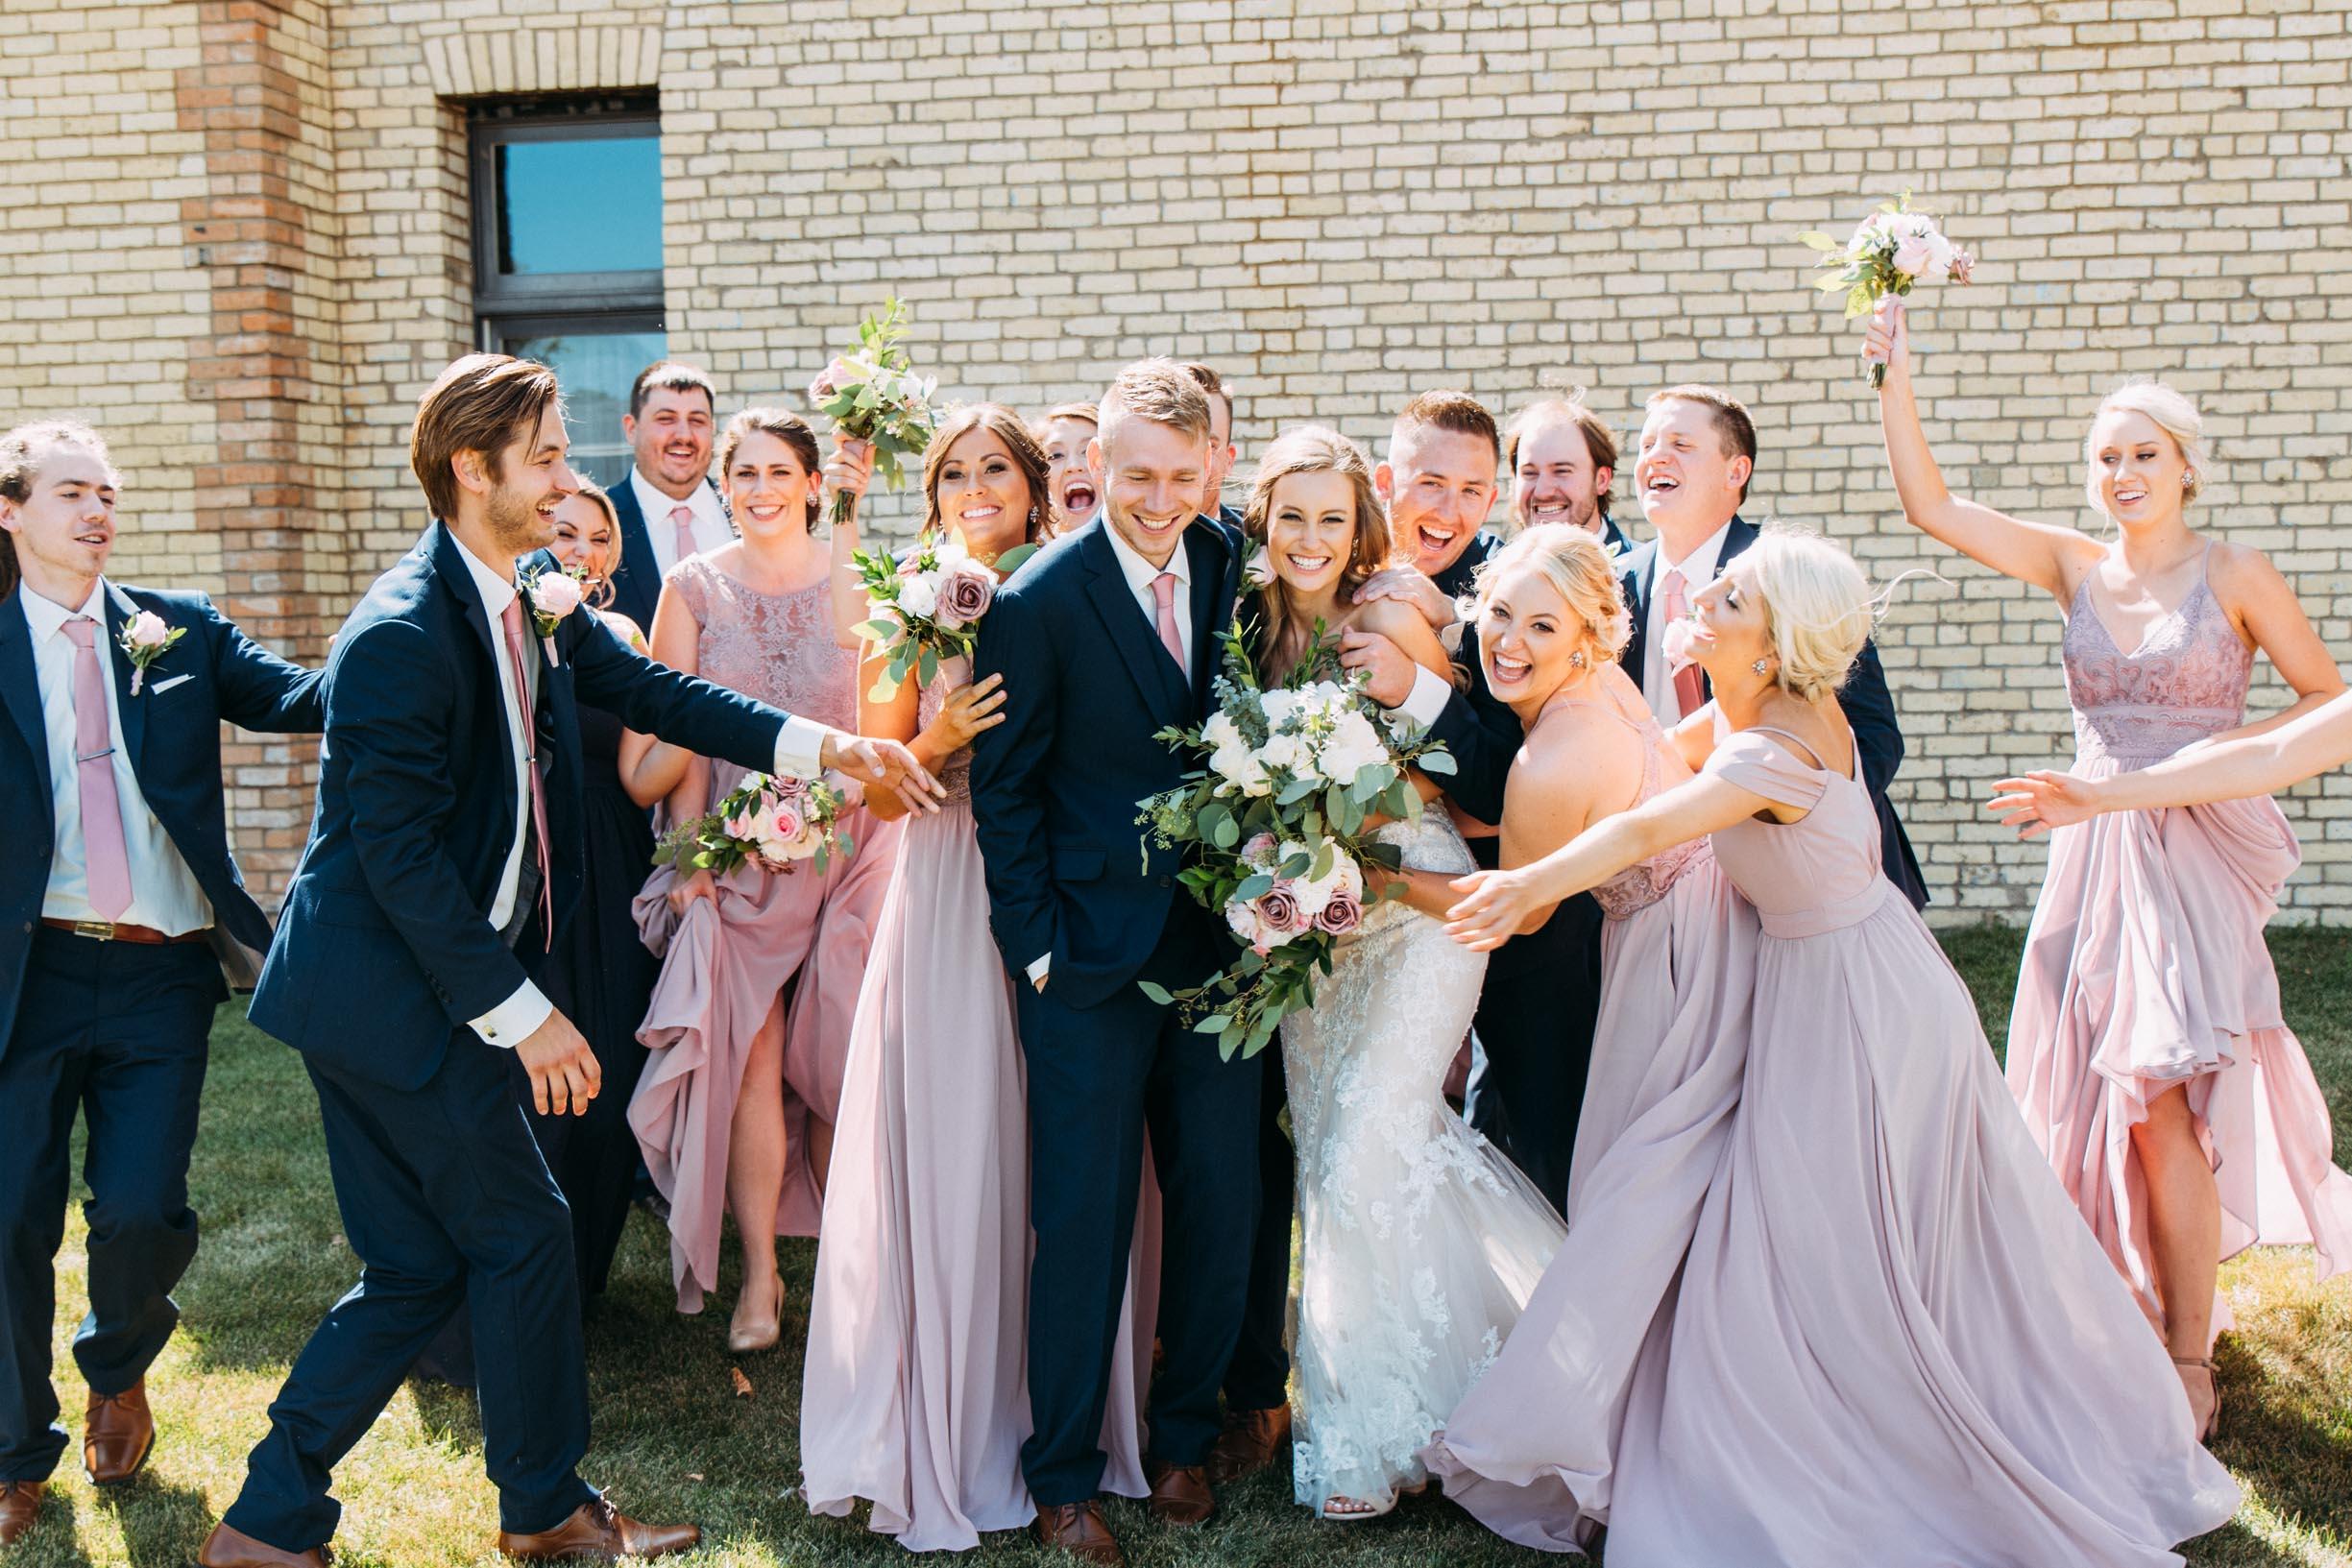 45-WeddingsattheBroz_Minnesota_WeddingBlog_WeddingParty.jpg